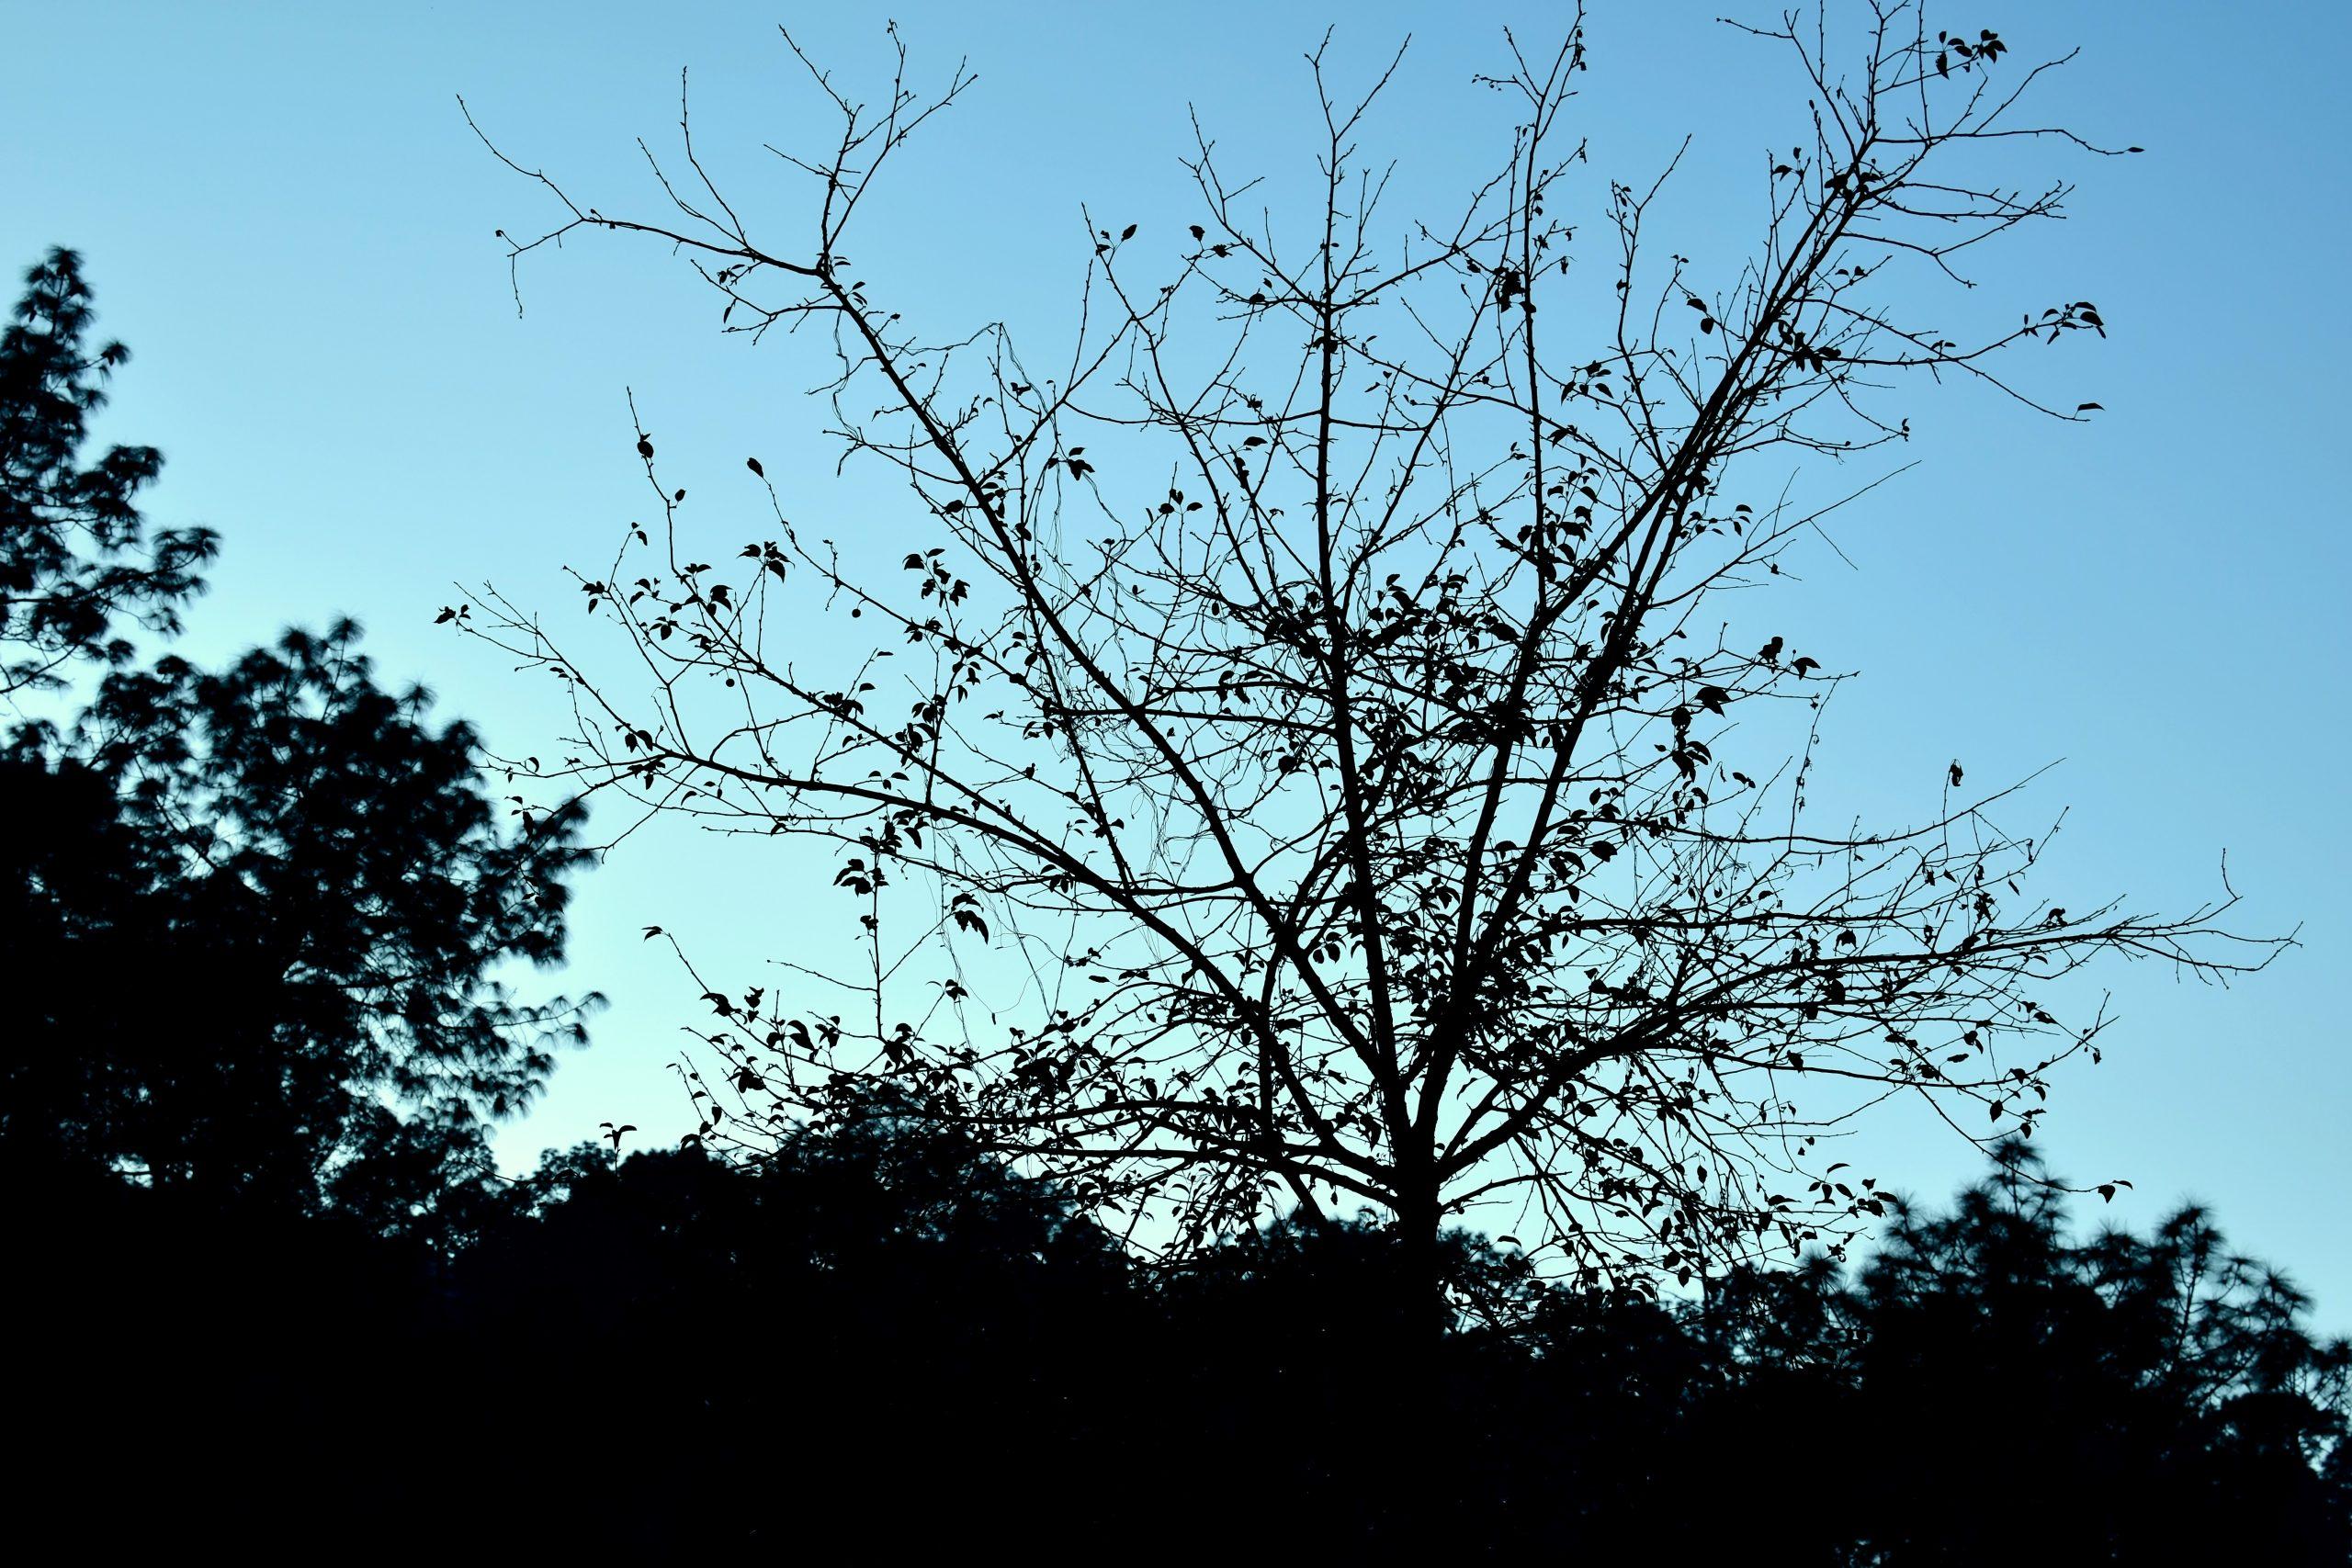 Tree in darkness